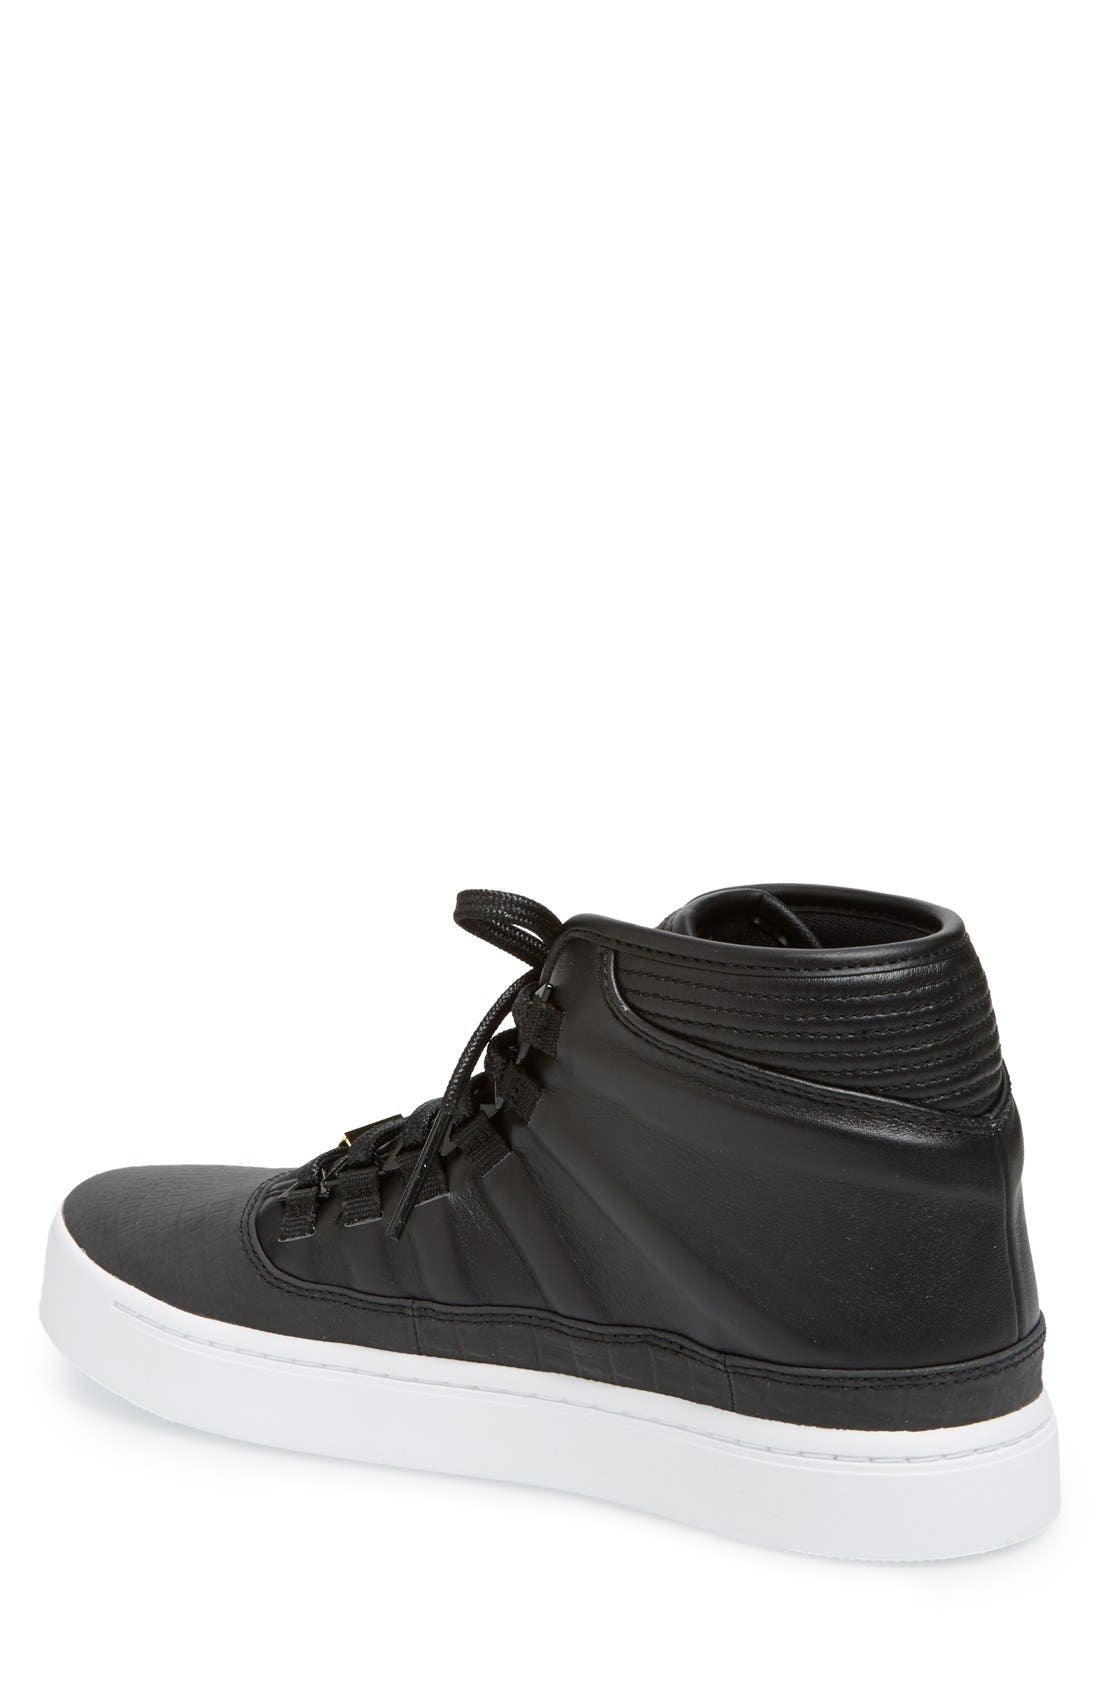 'Jordan - Westbrook 0' High Top Sneaker,                             Alternate thumbnail 4, color,                             001